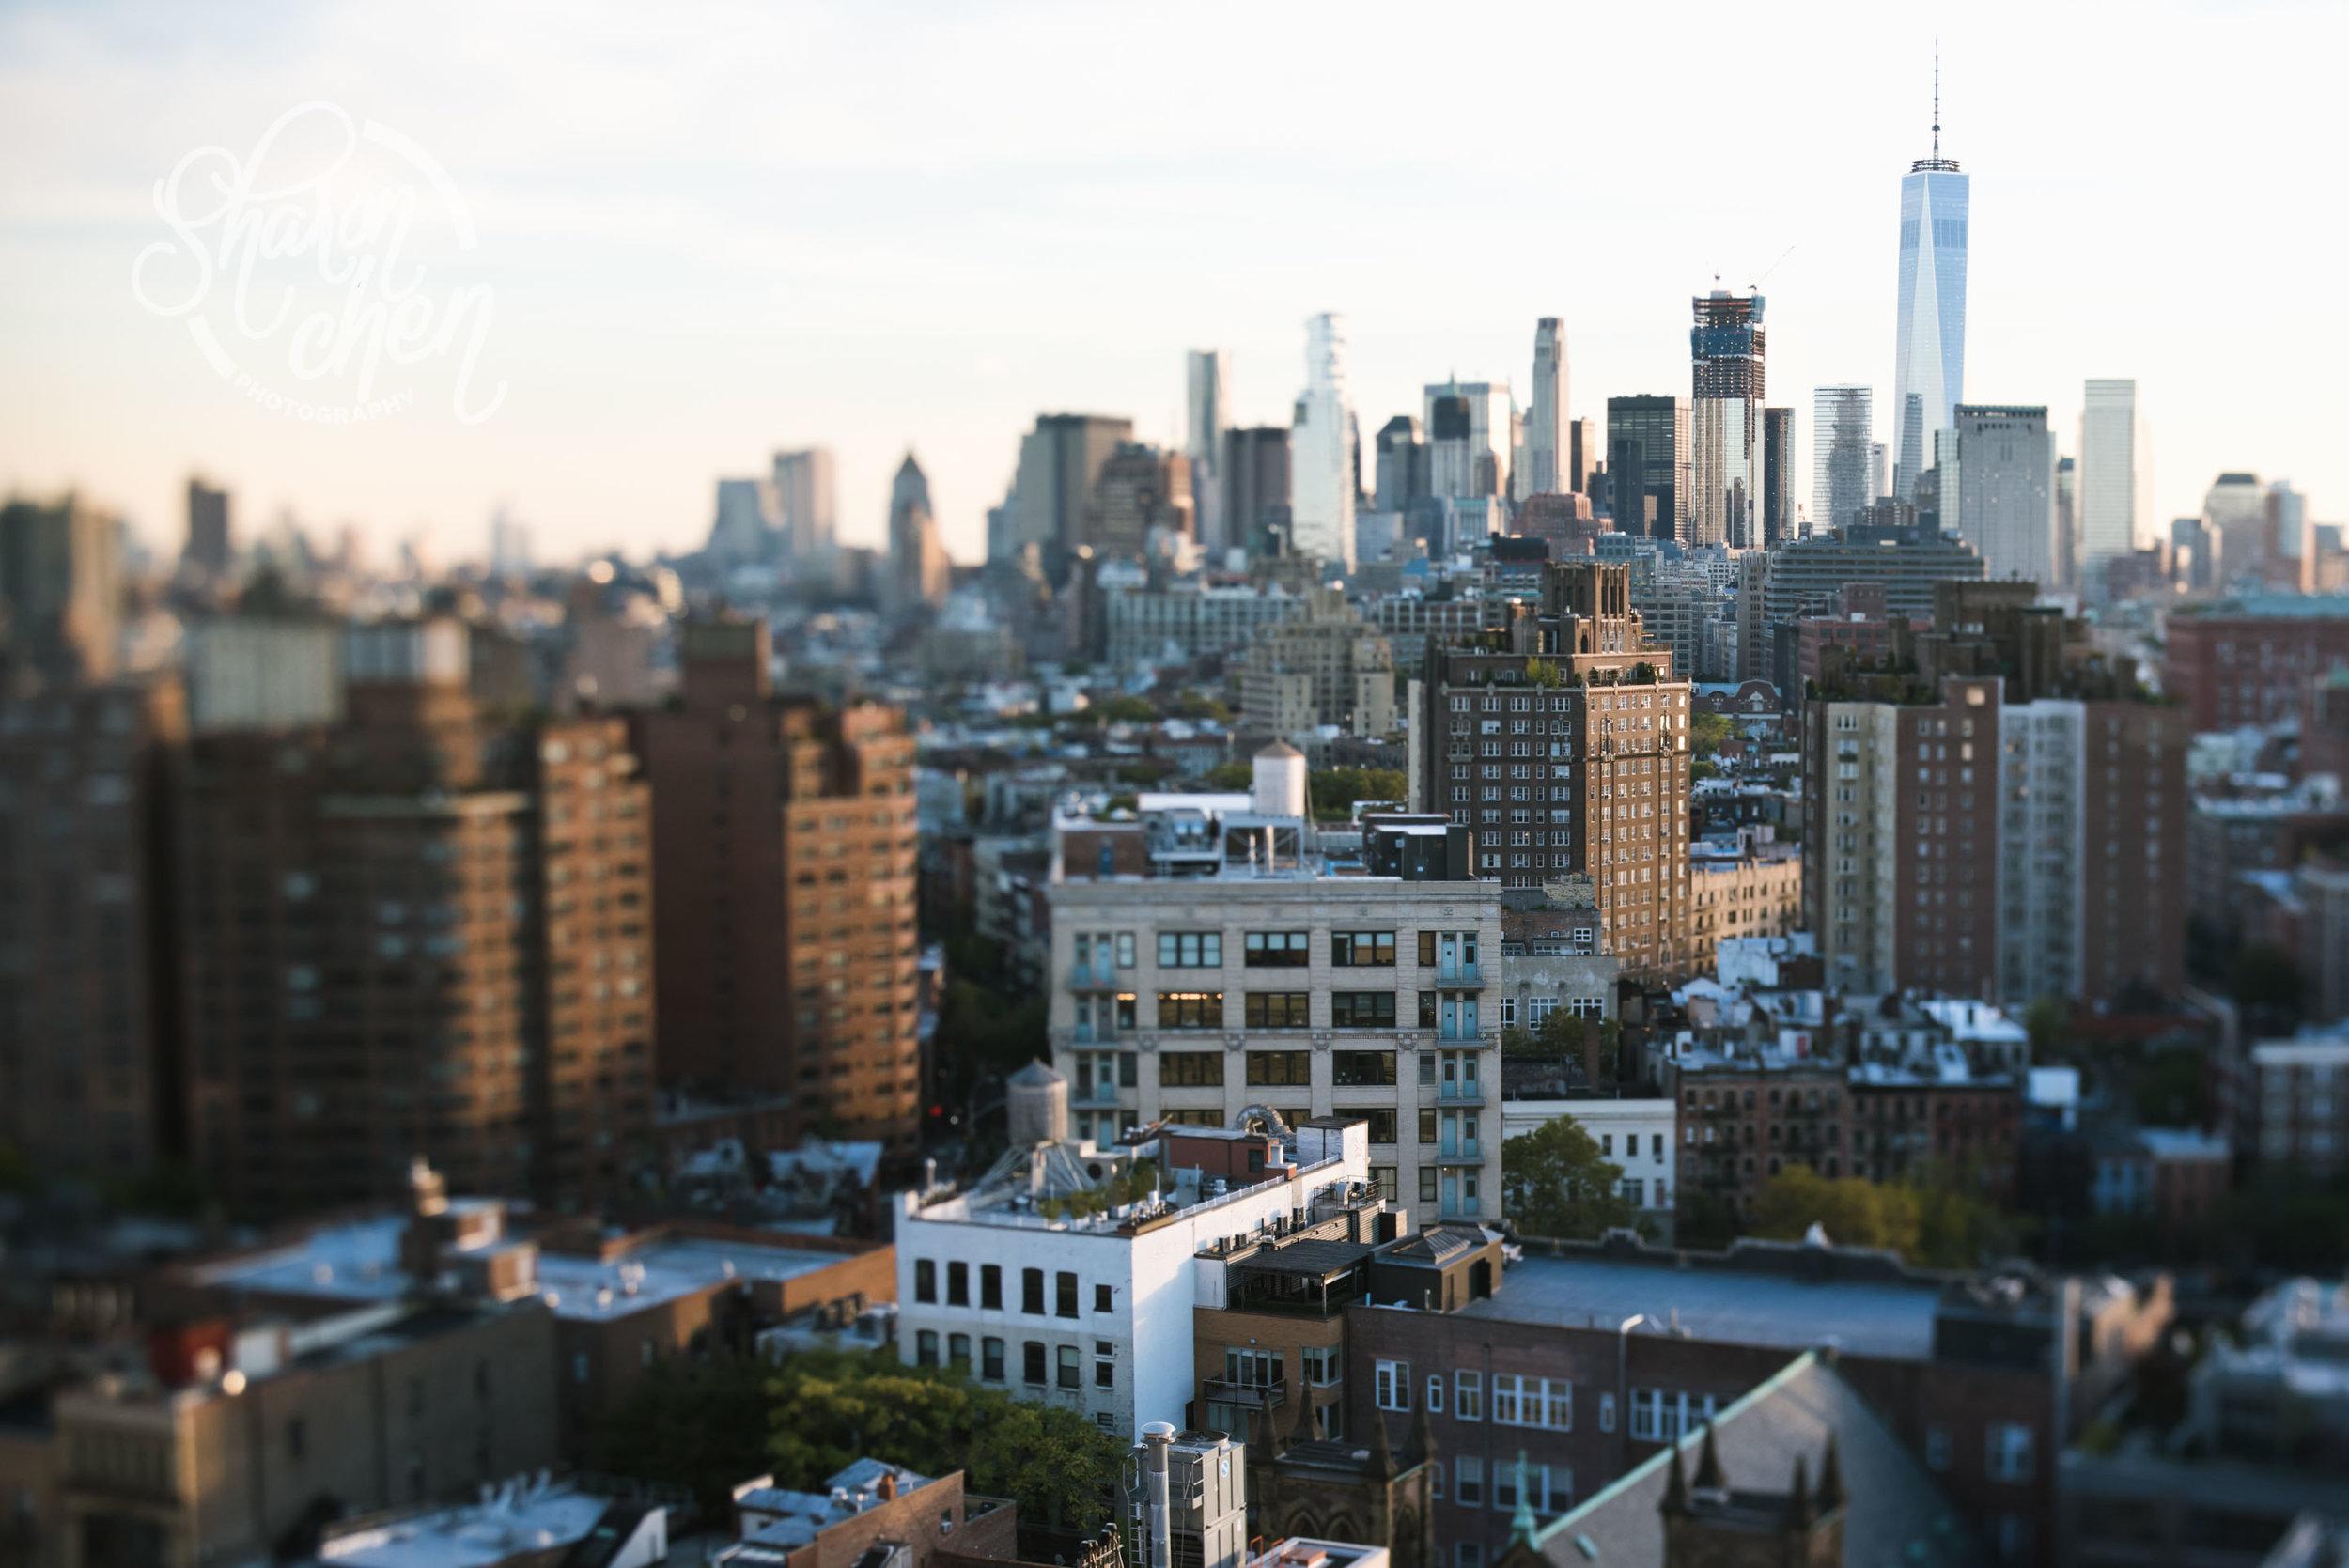 The downtown skyline.